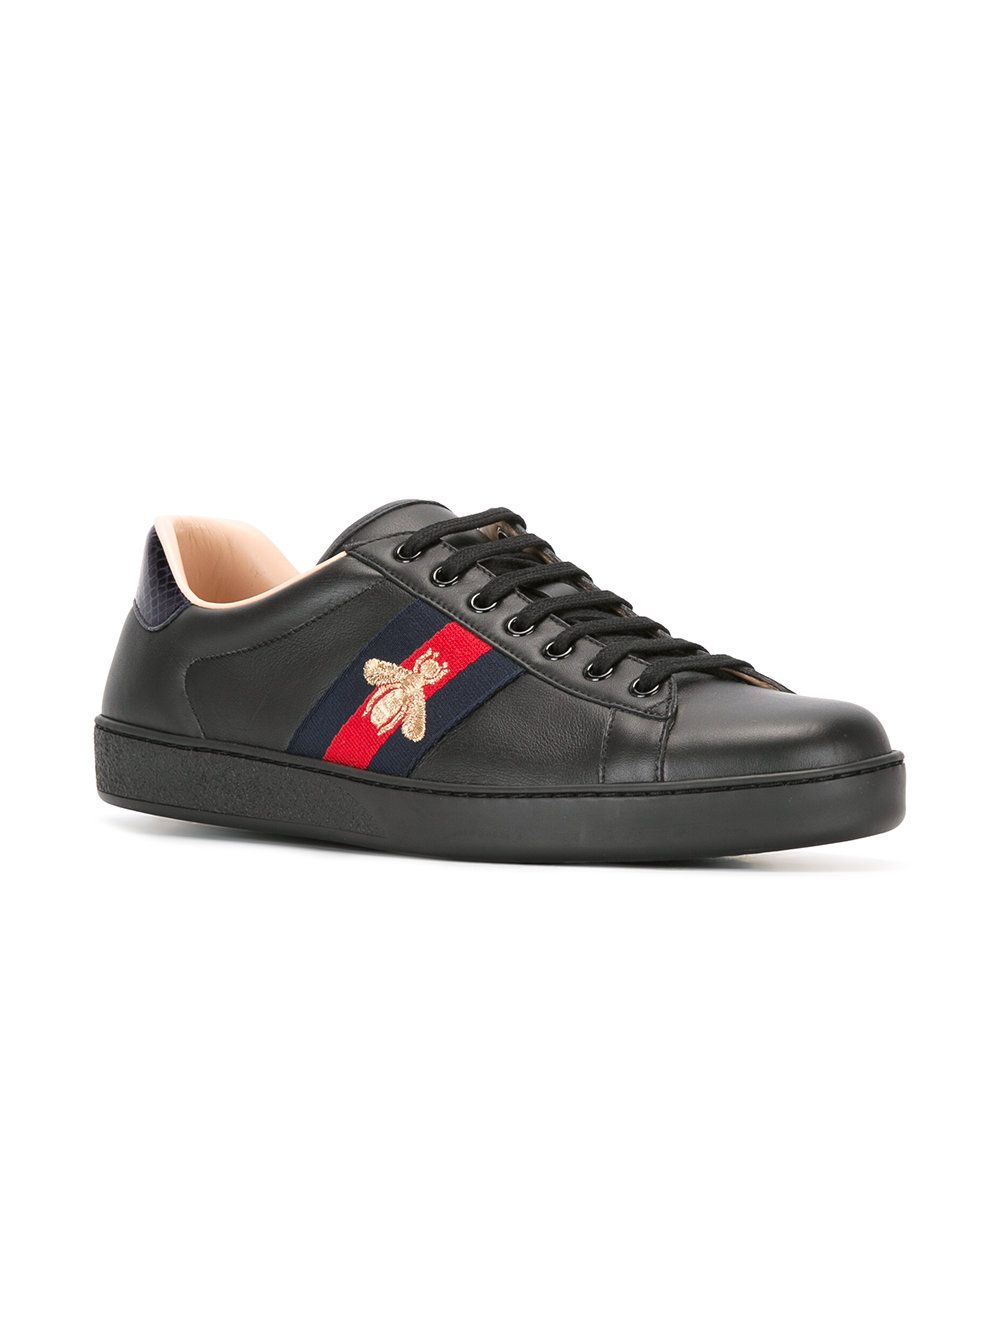 Gucci Ace Bee Sneaker For Men - Buy